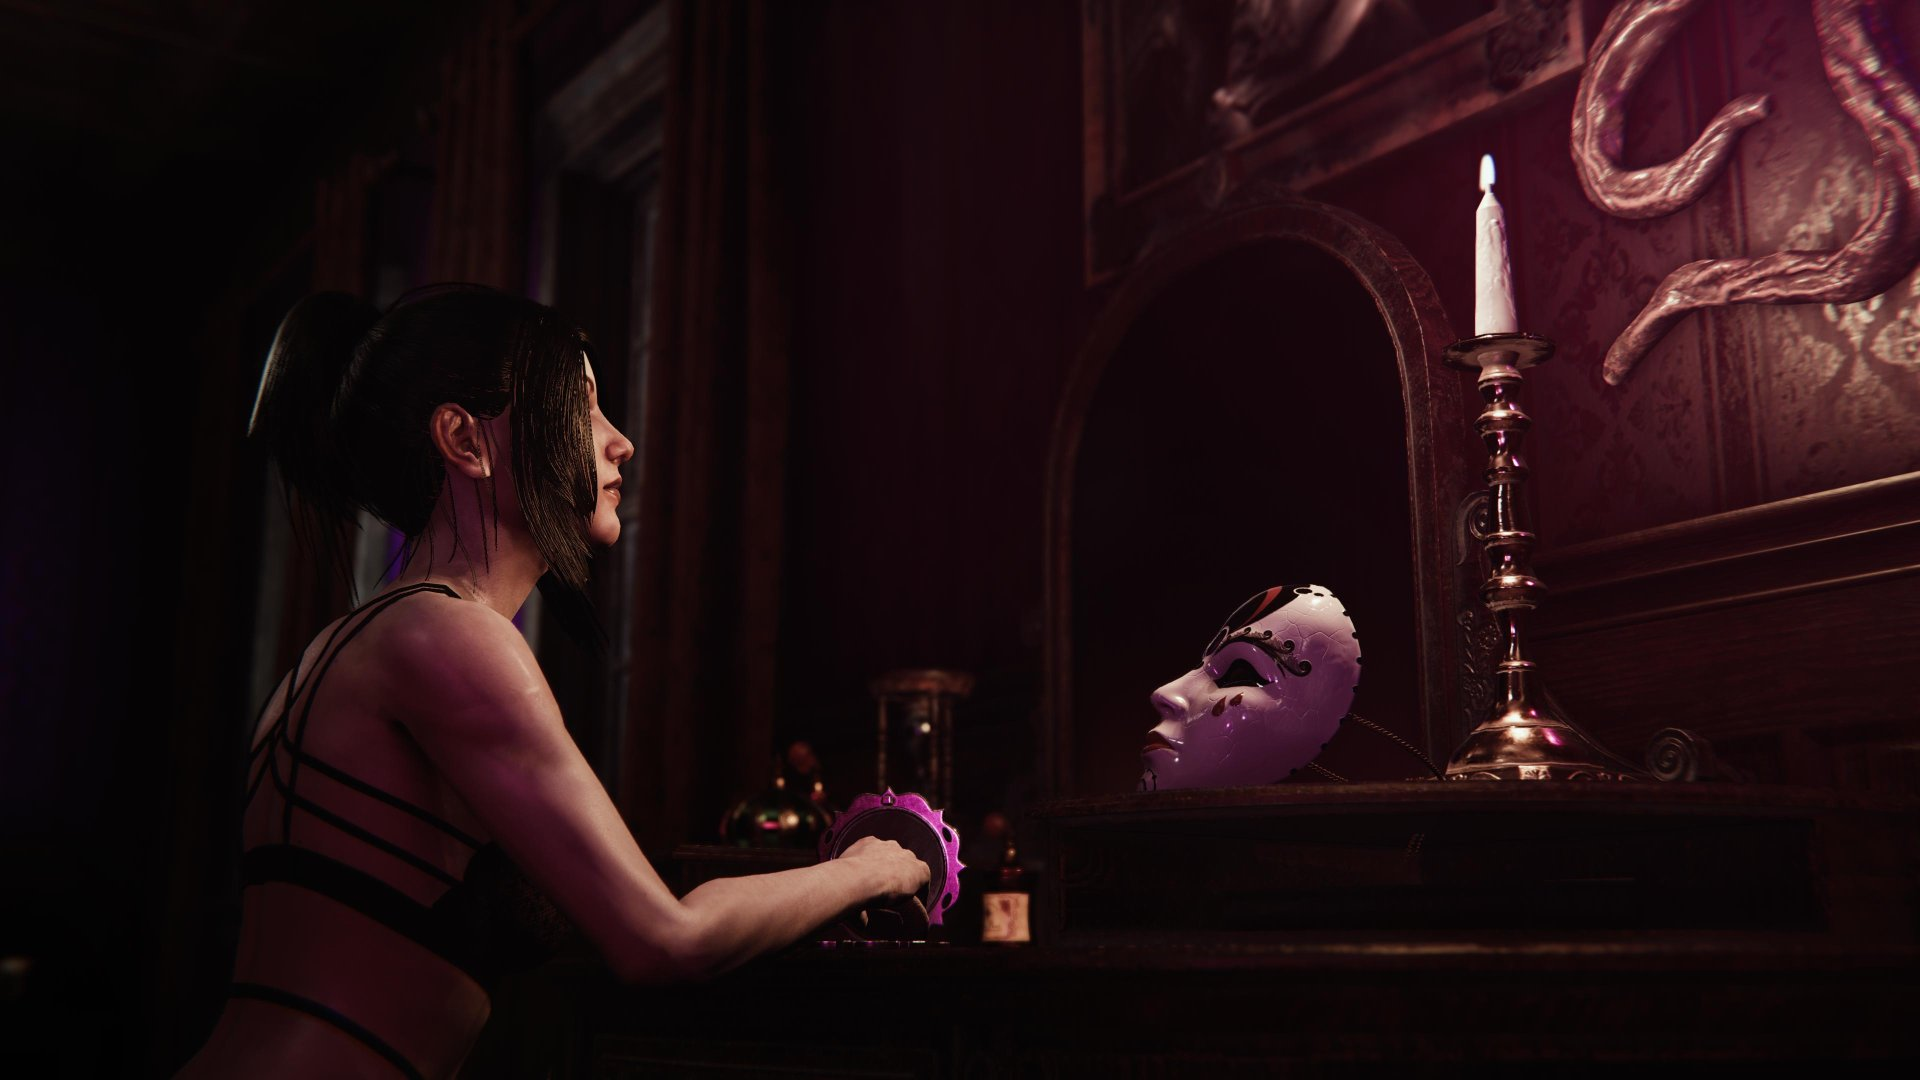 Lust from Beyond | Movie Games Lunarium, PlayWay S.A.